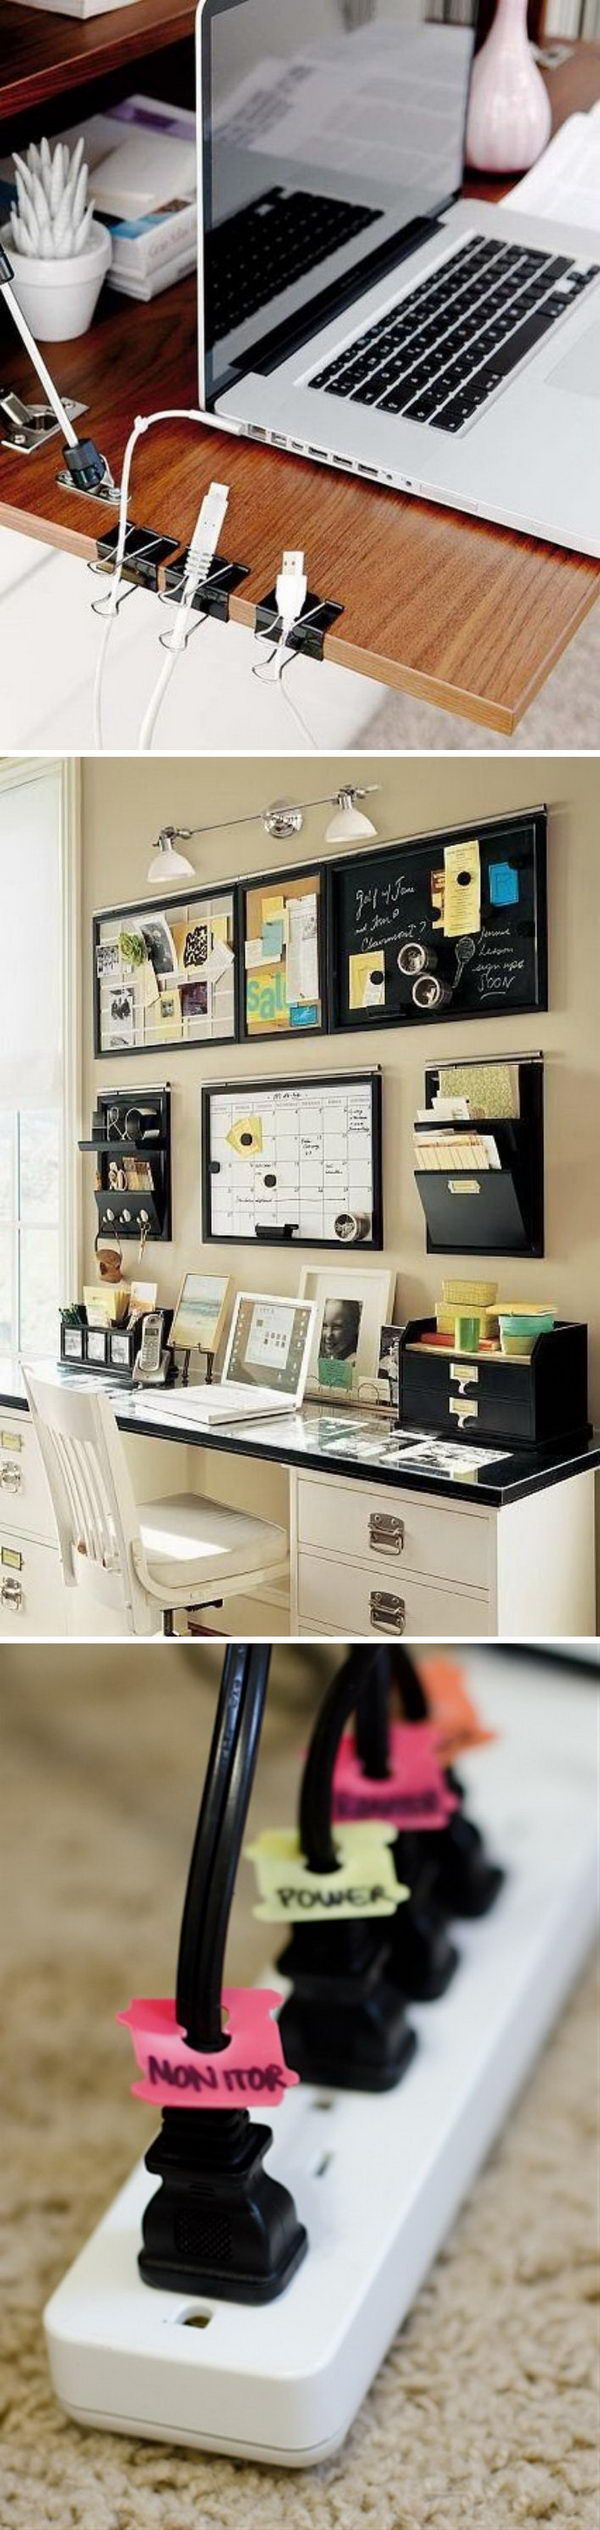 Effective Home Office Organization Ideas